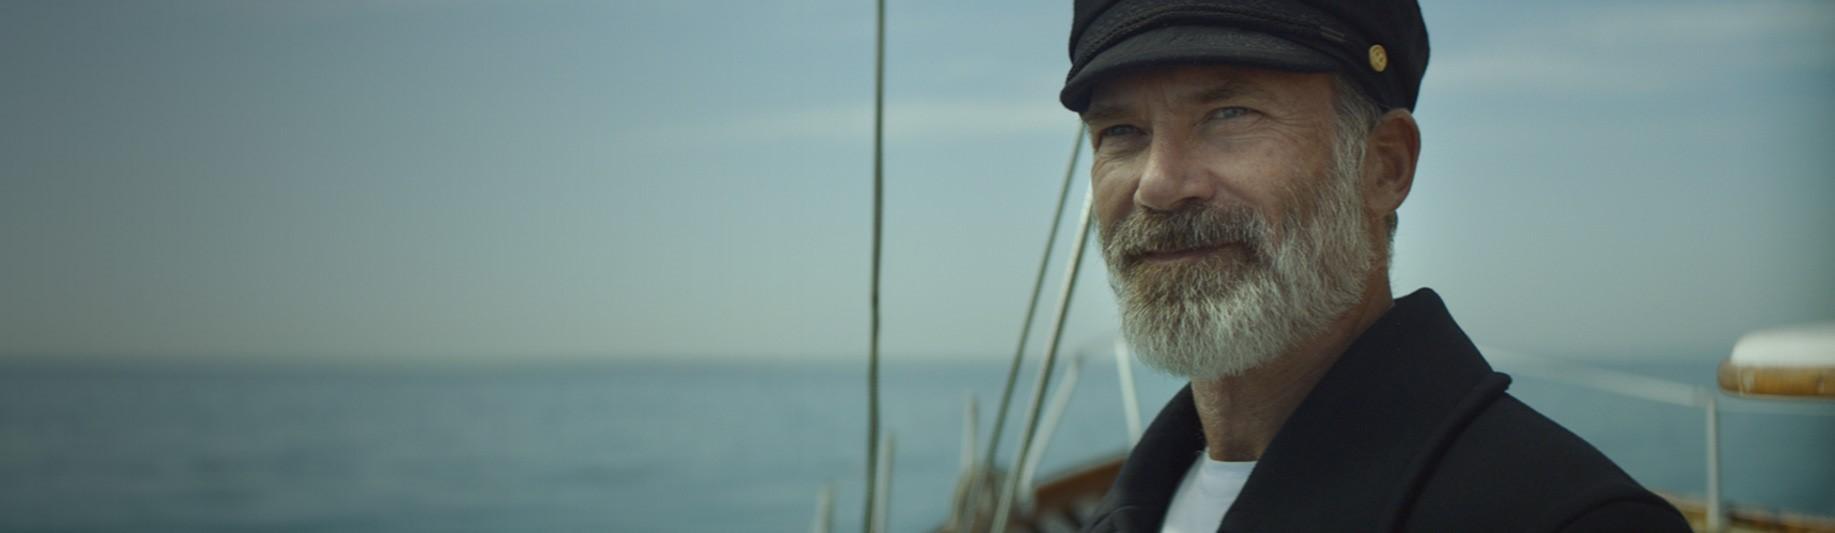 captain Birds Eye on a boat